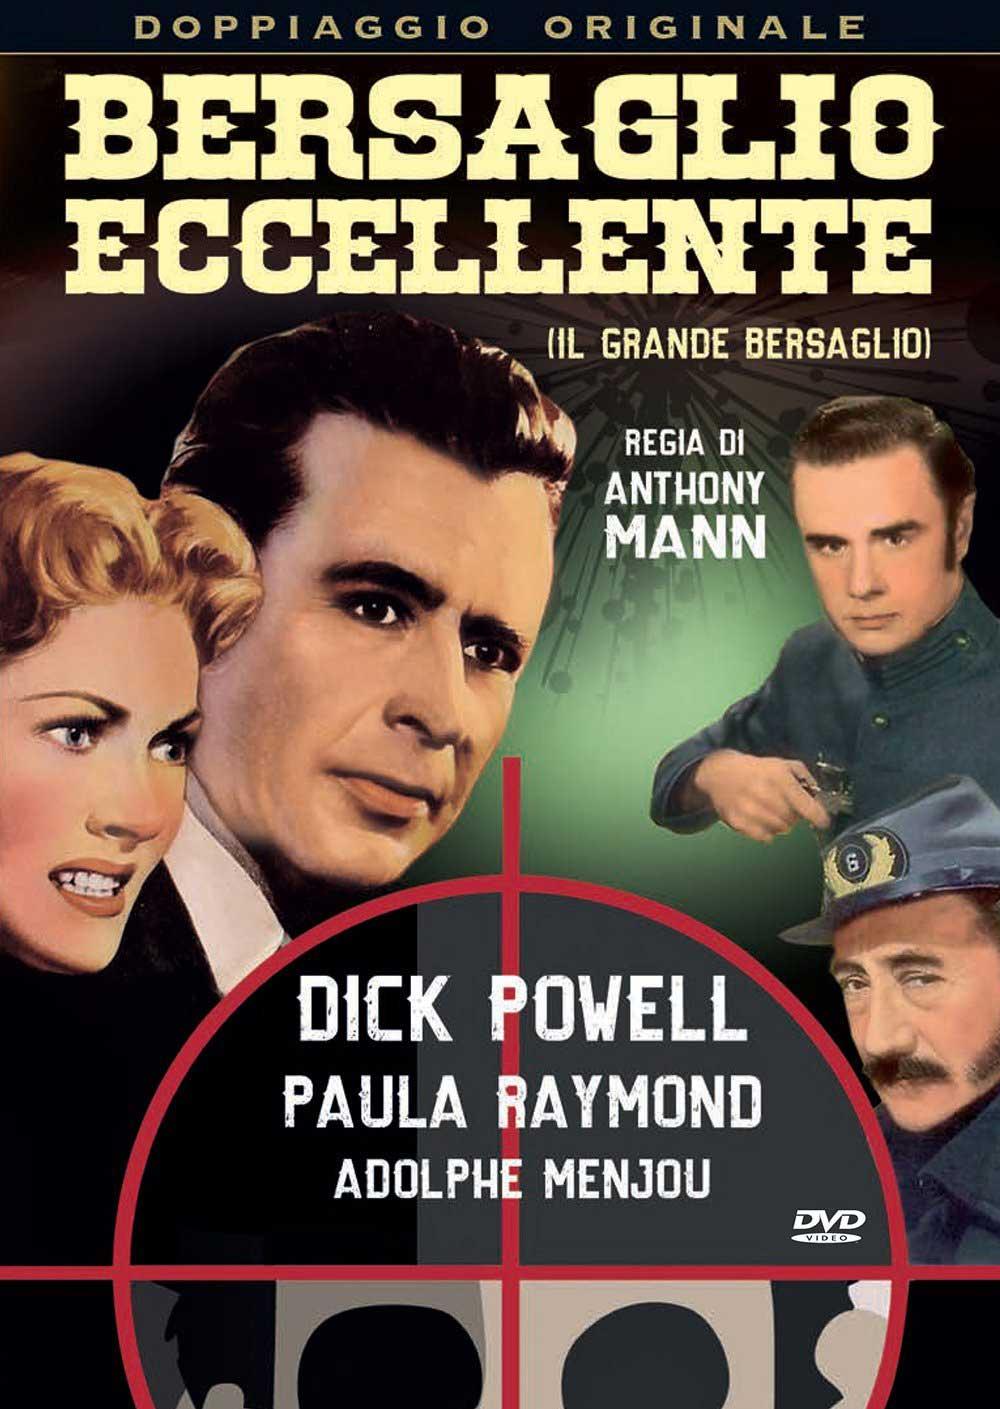 BERSAGLIO ECCELLENTE (DVD)